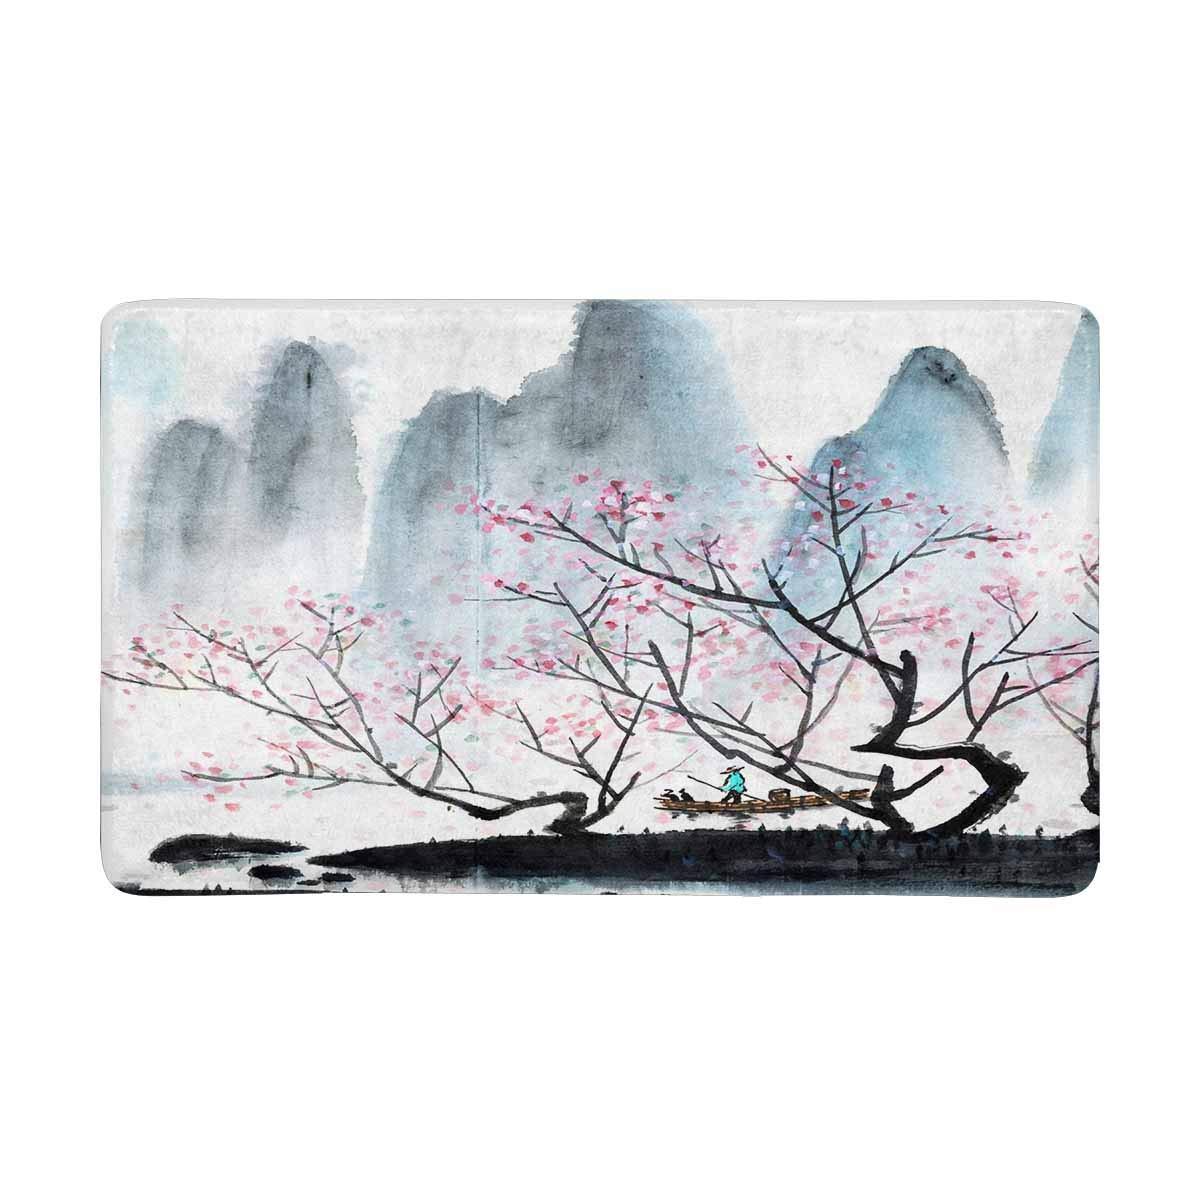 InterestPrint Chinese Landscape Ink Wash Painting Plum Blossom Doormat Indoor Entrance Rug Floor Mats Shoe Scraper Door Mat Non-Slip Home Decor, Rubber Backing Large 30 X 18 Inches